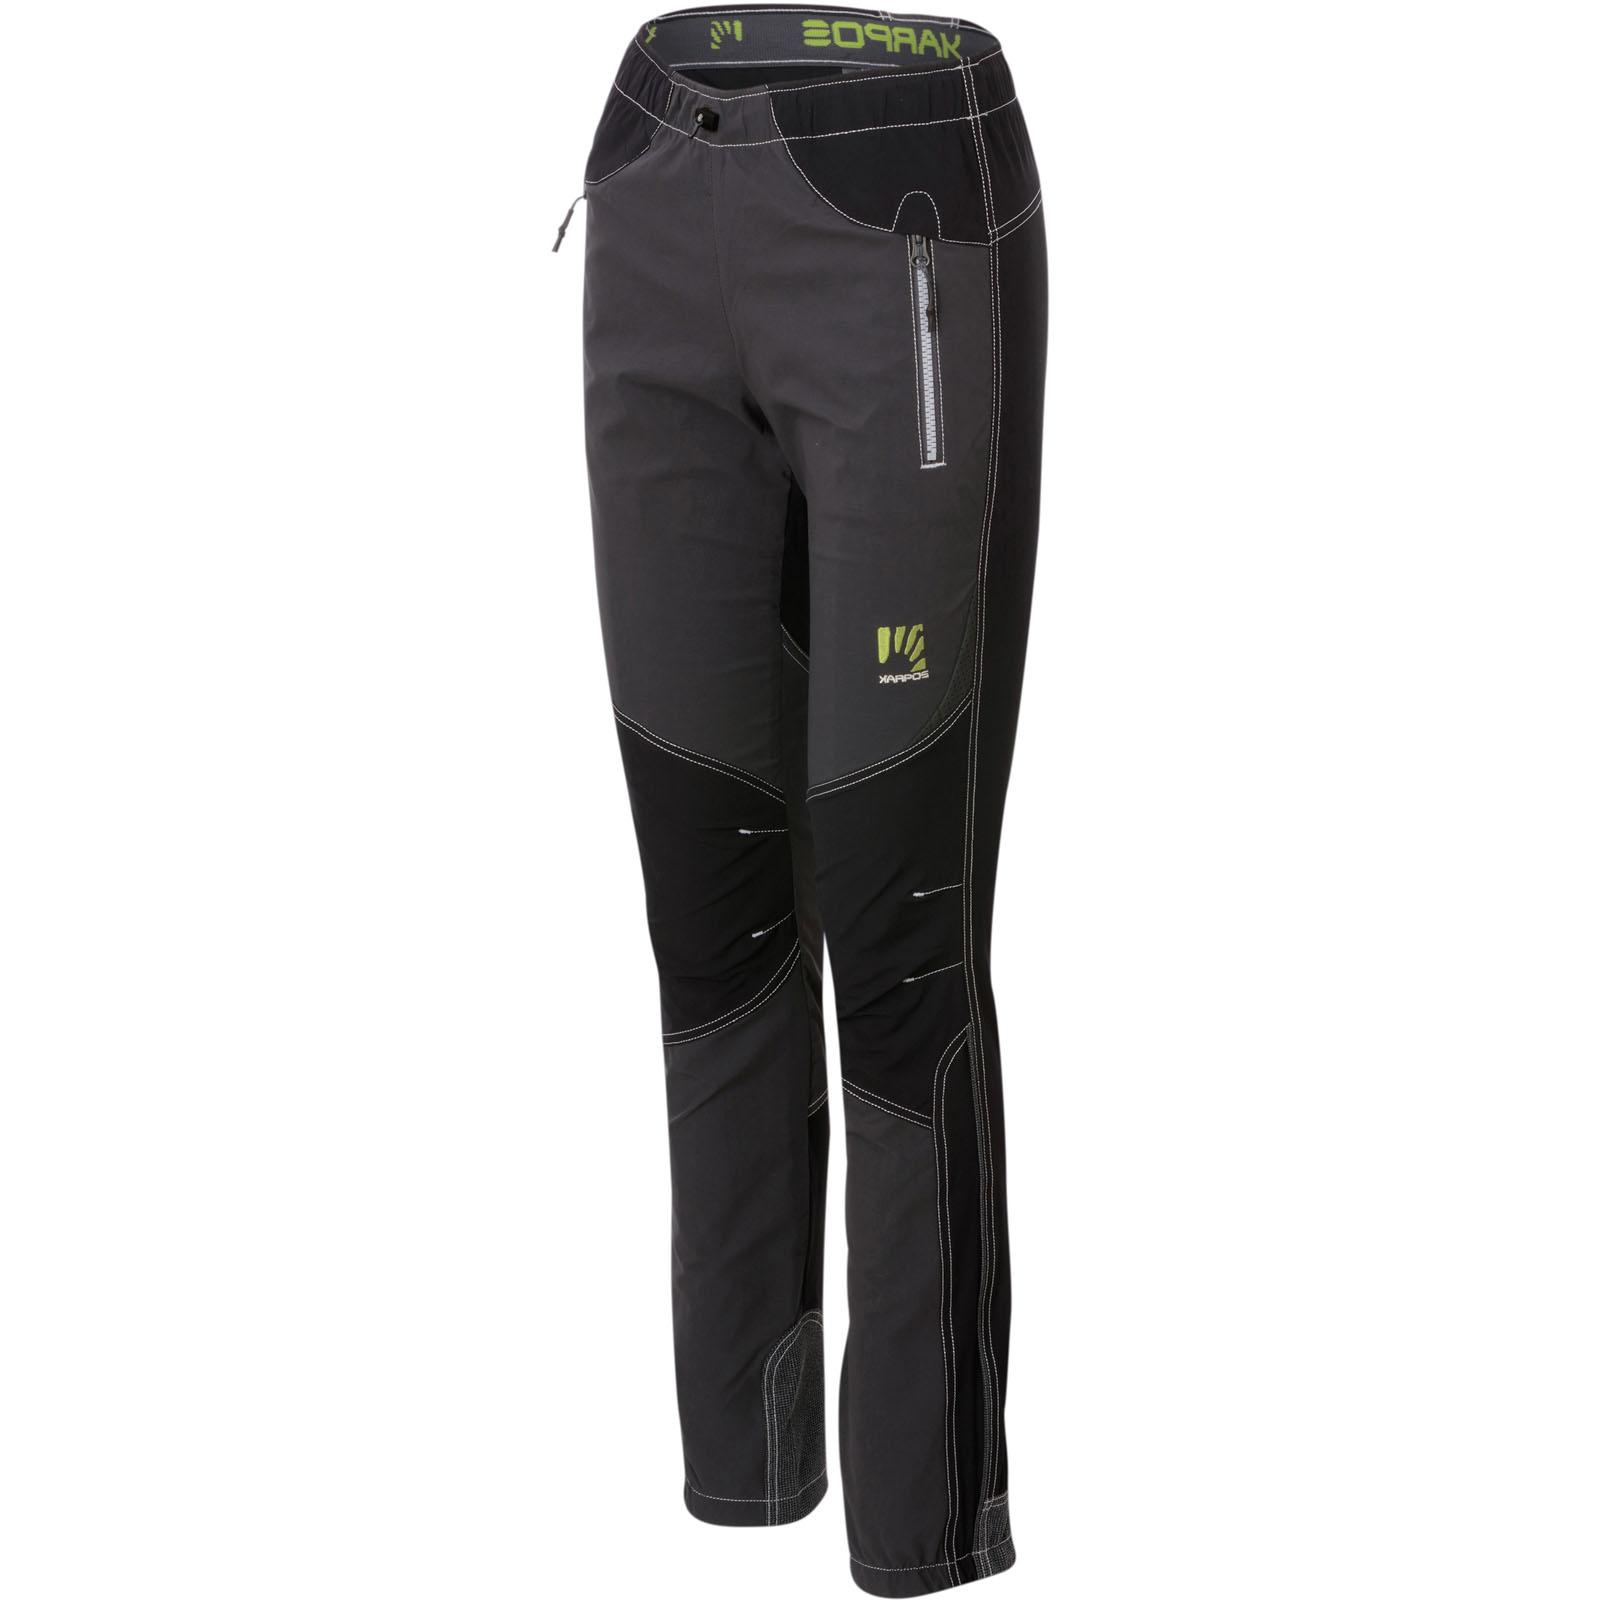 11e3c1cdc1c3 Karpos ROCK dámske nohavice sivé čierne